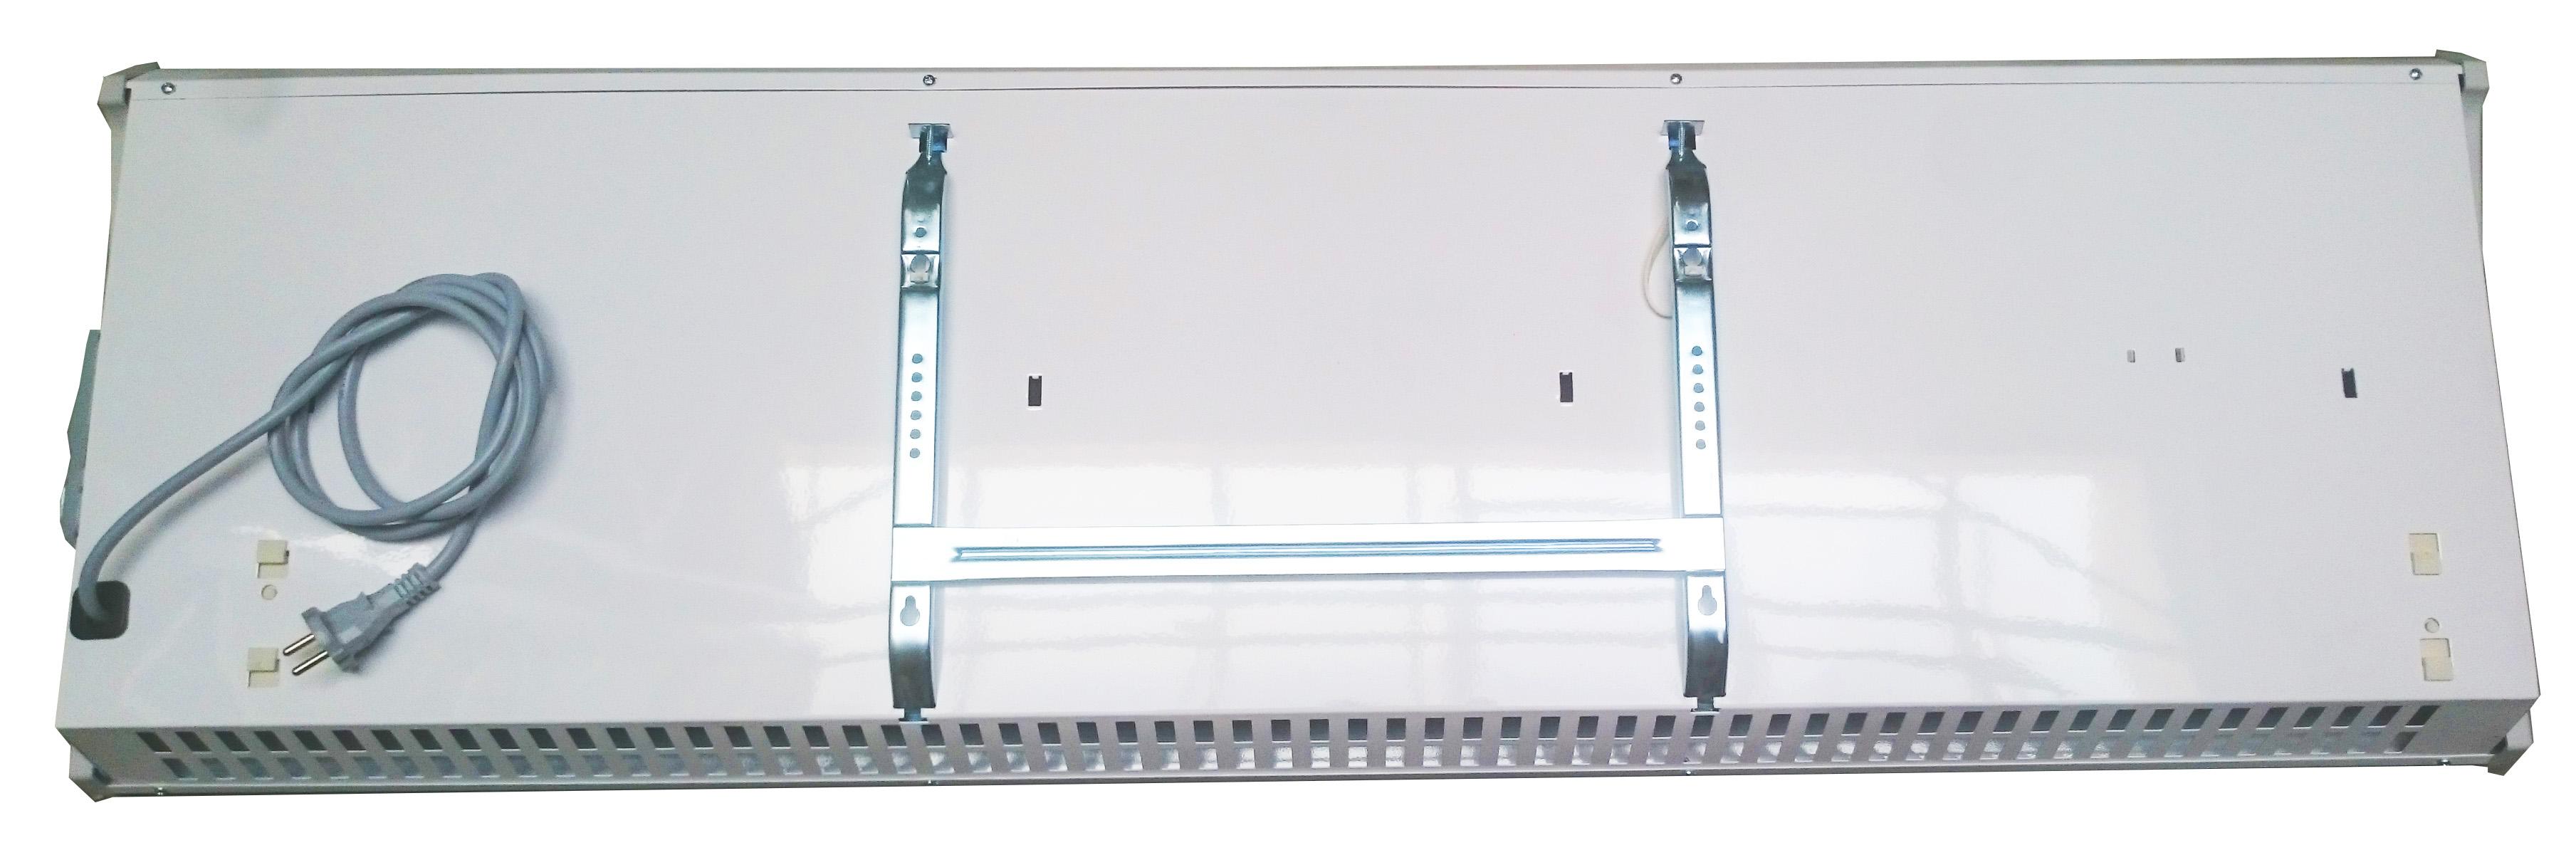 elektro heizkoerper heizung 2400 watt heizk rper wand. Black Bedroom Furniture Sets. Home Design Ideas